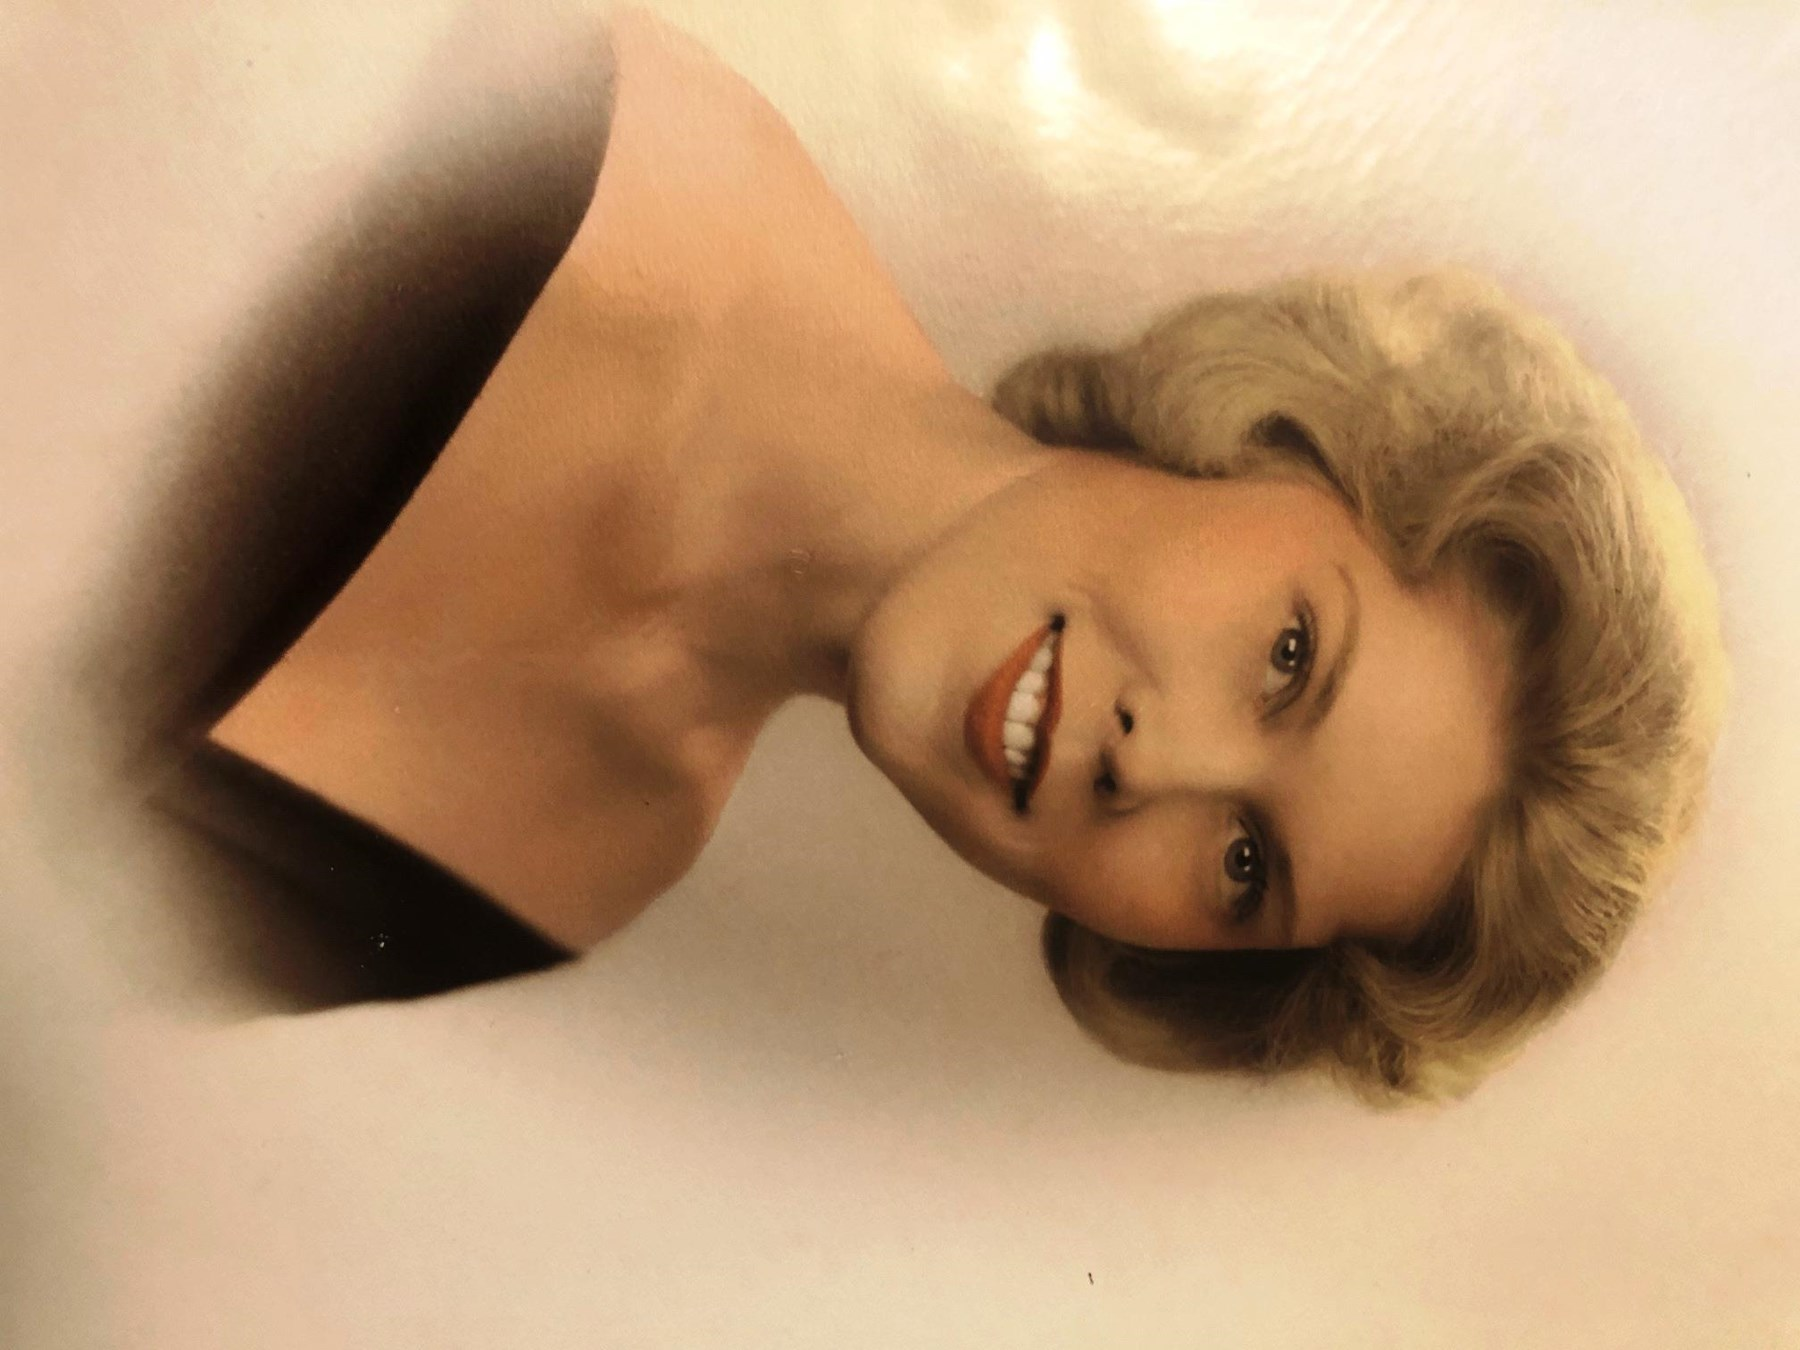 Patricia Burke nudes (88 photos), Ass, Bikini, Selfie, underwear 2020